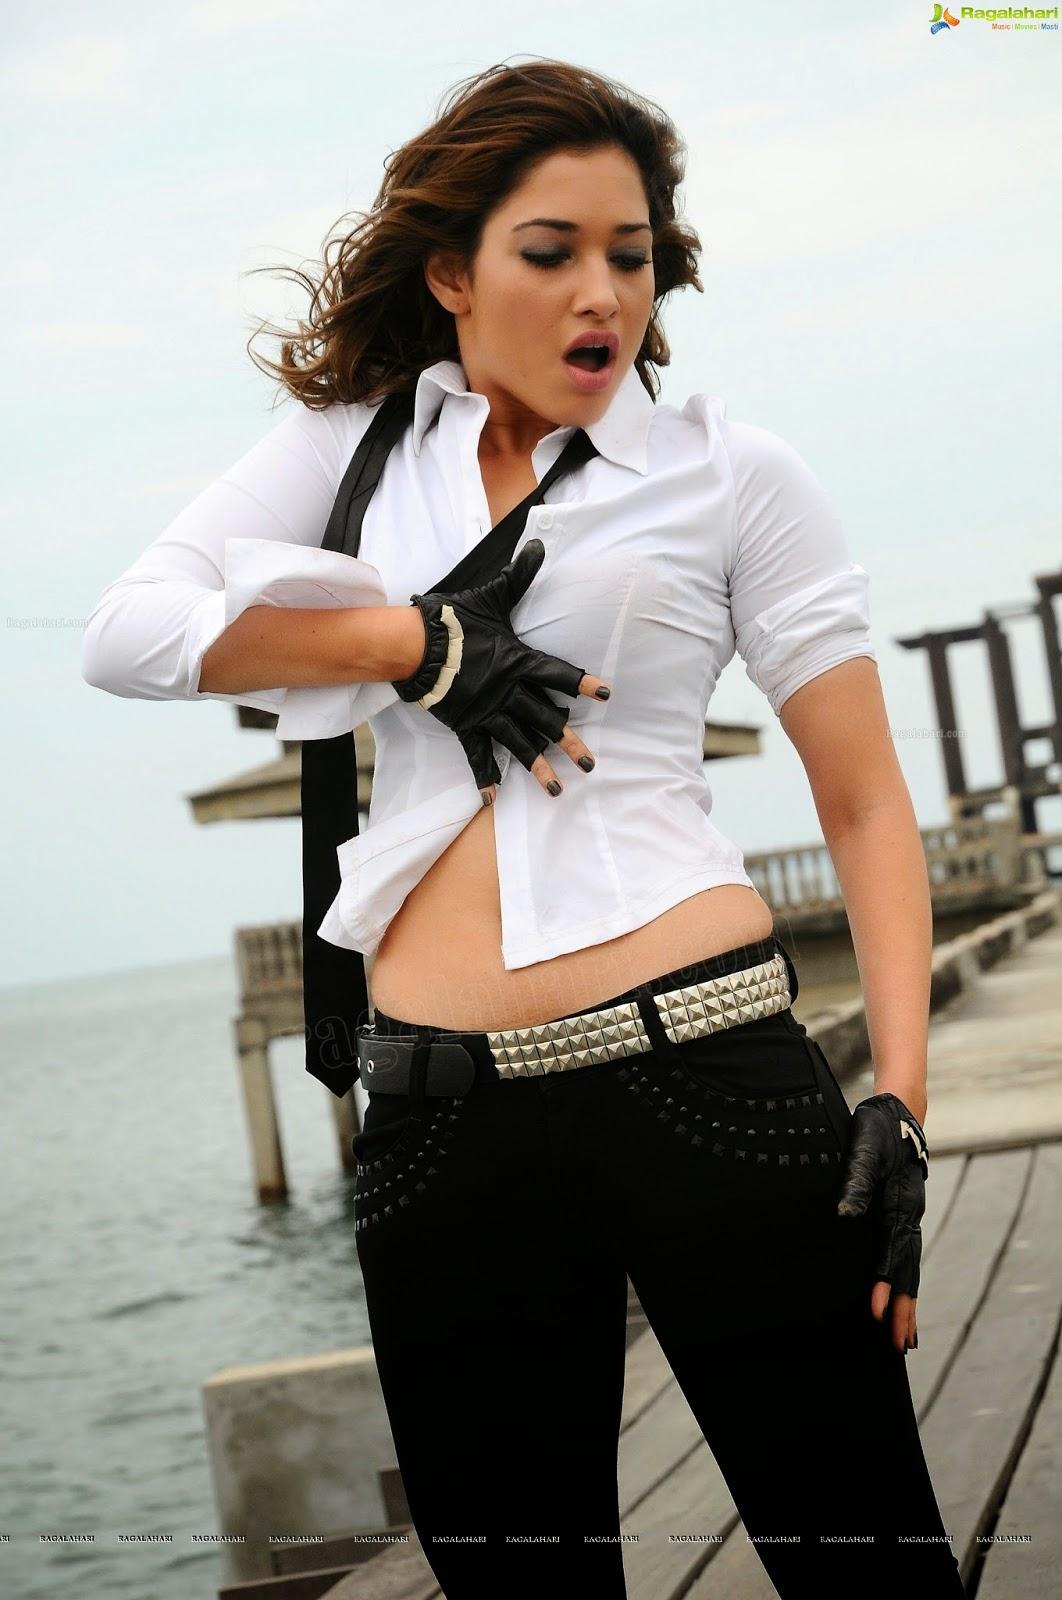 wsww: tamanna bhatia black tight milky hottest song in telugu film